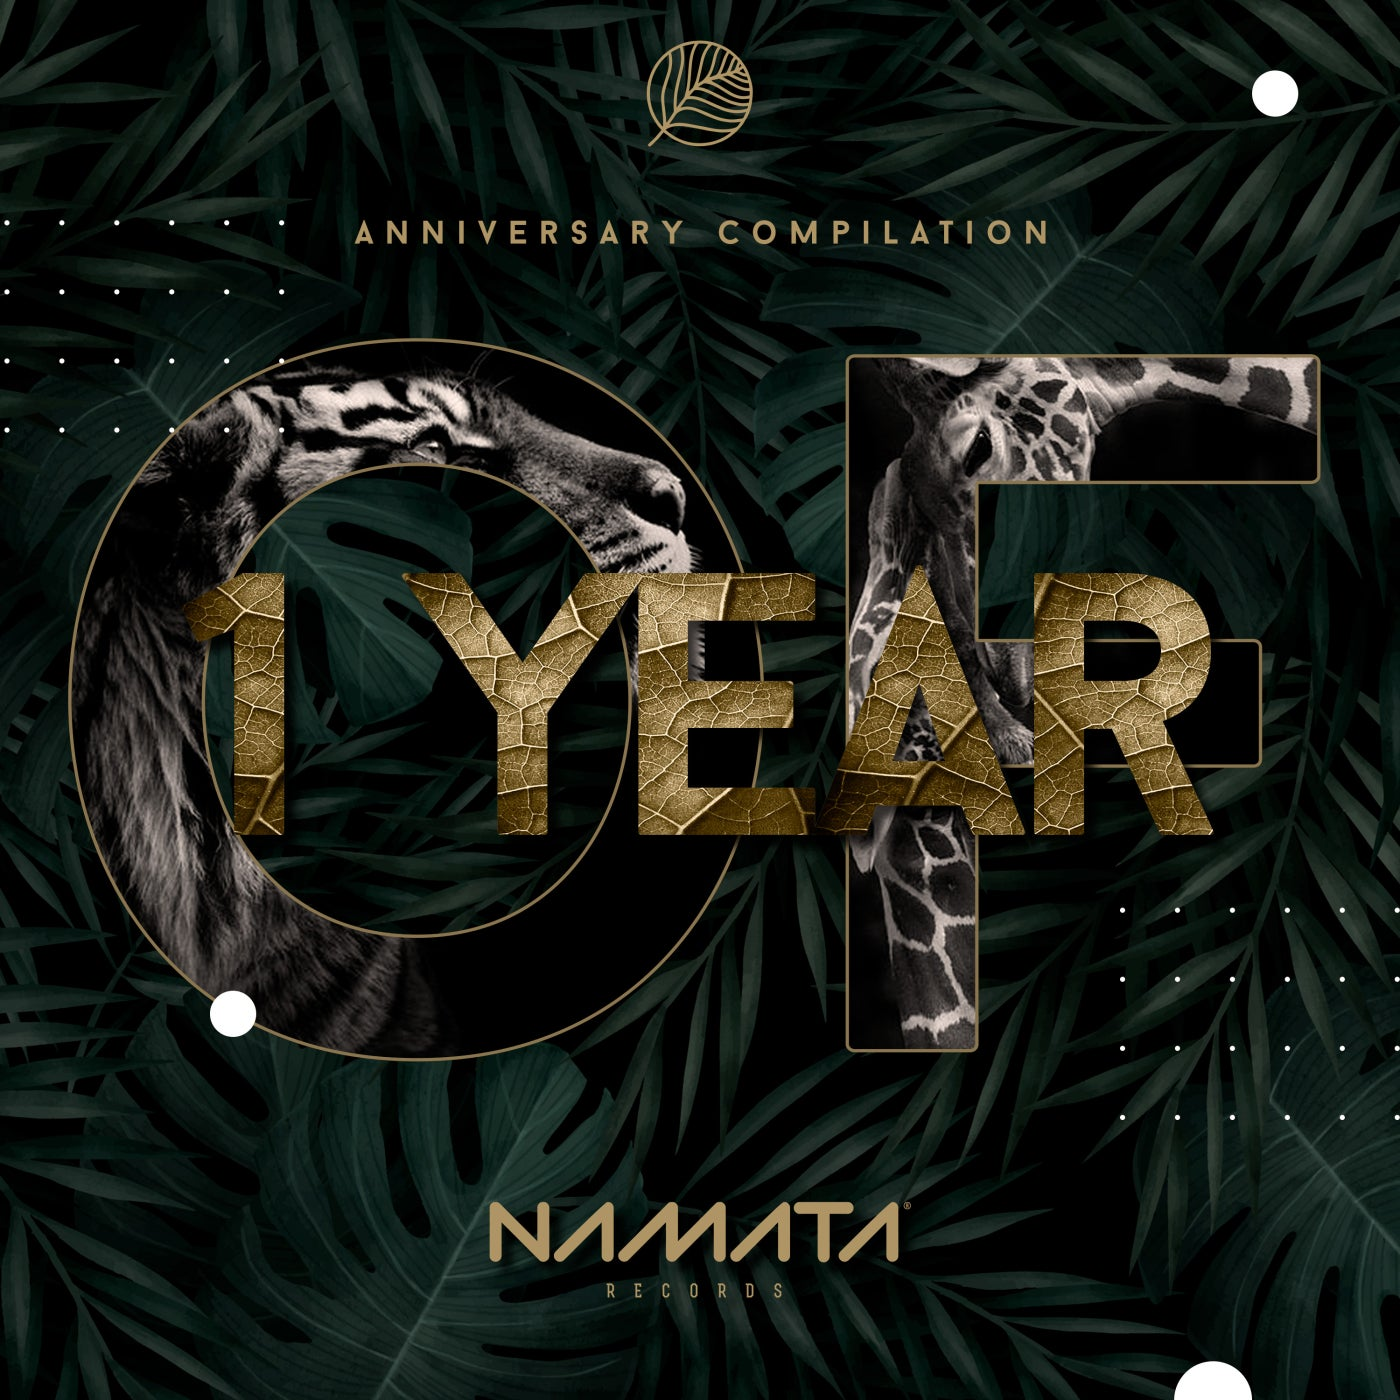 Namata Records - VA